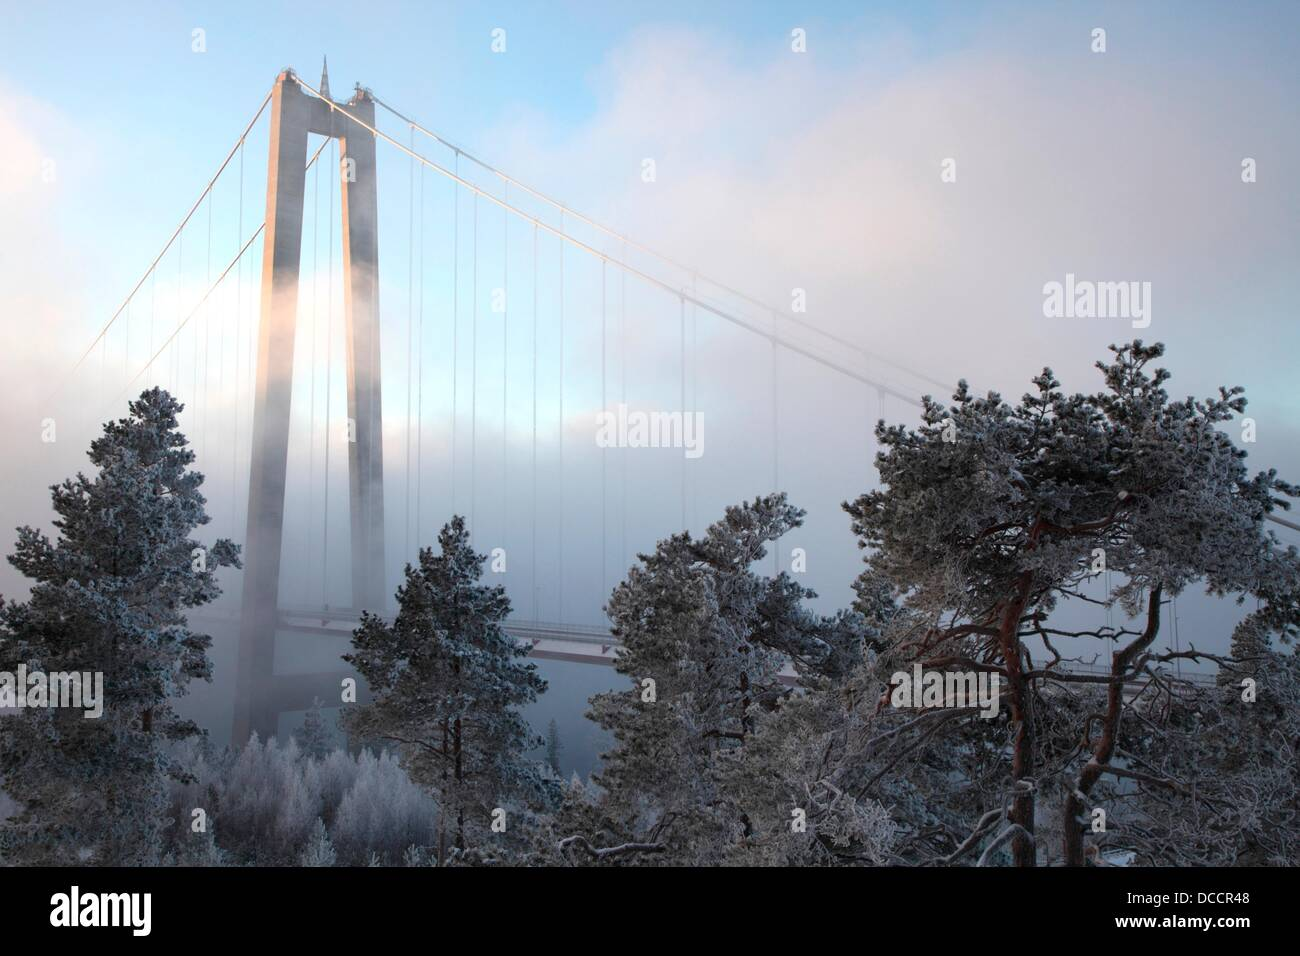 The High-Coast Bridge (Höga-Kusten Bro) on a very cold day in Västernorrland, Sweden. Clouds of steam - Stock Image